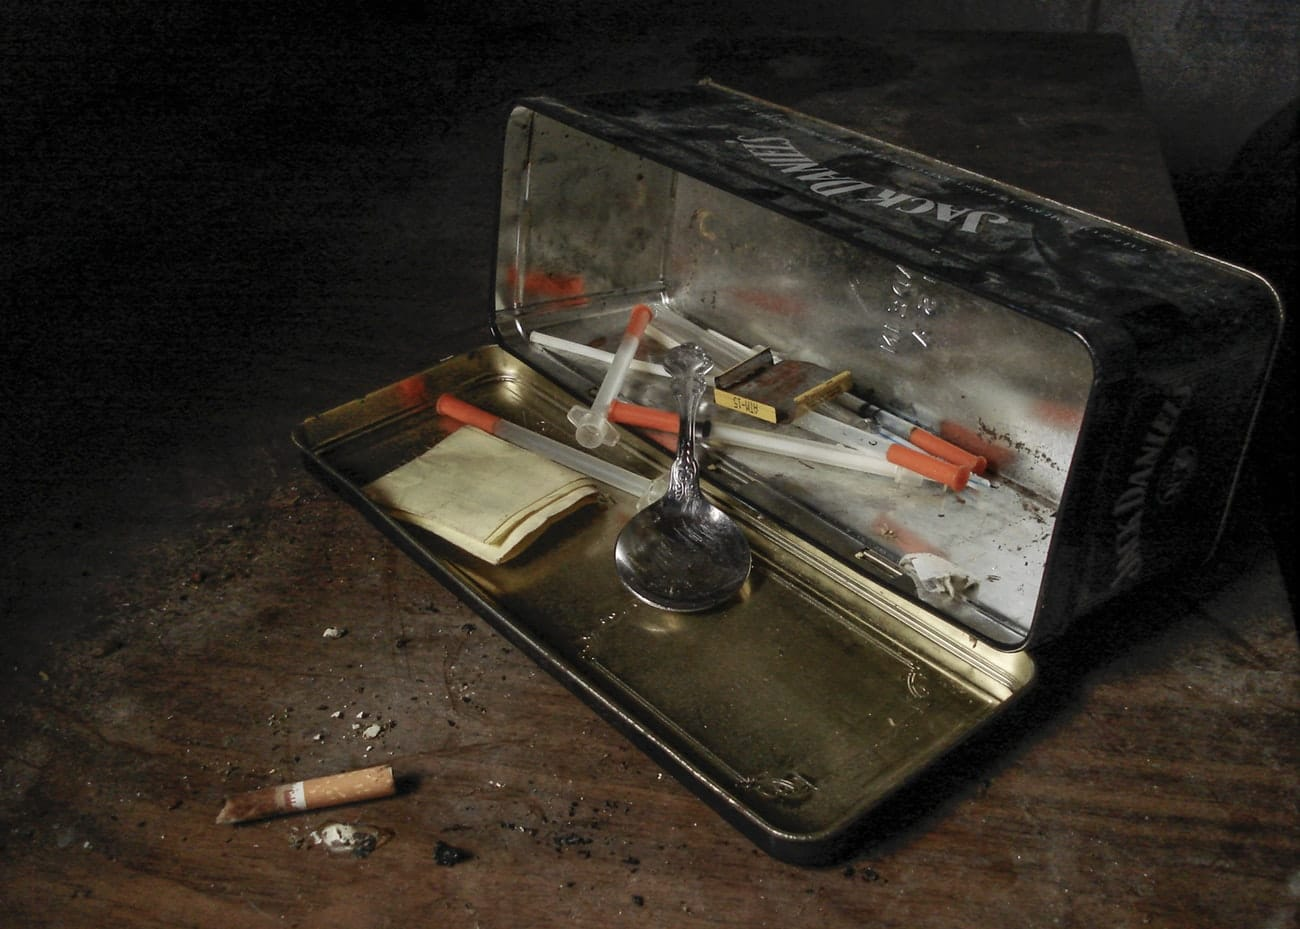 Fentanyl in Heroin